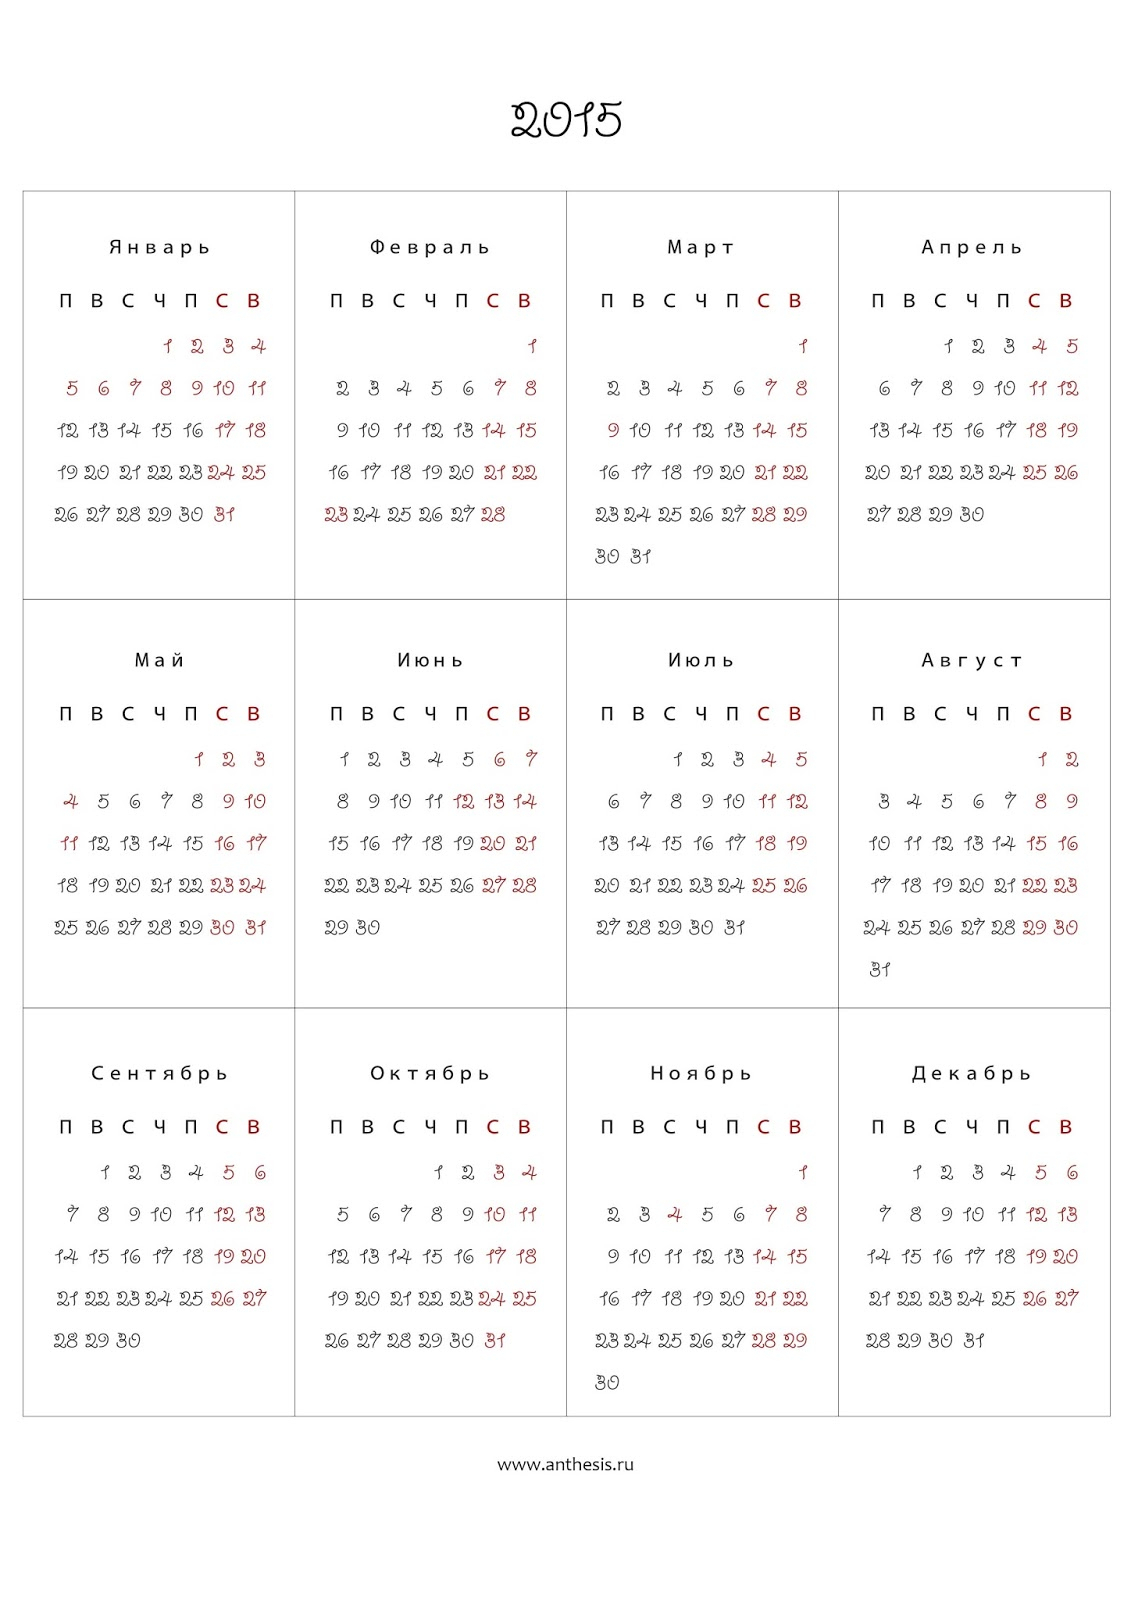 Anthesis: Шаблон. Календарная Сетка На 2015 Год.